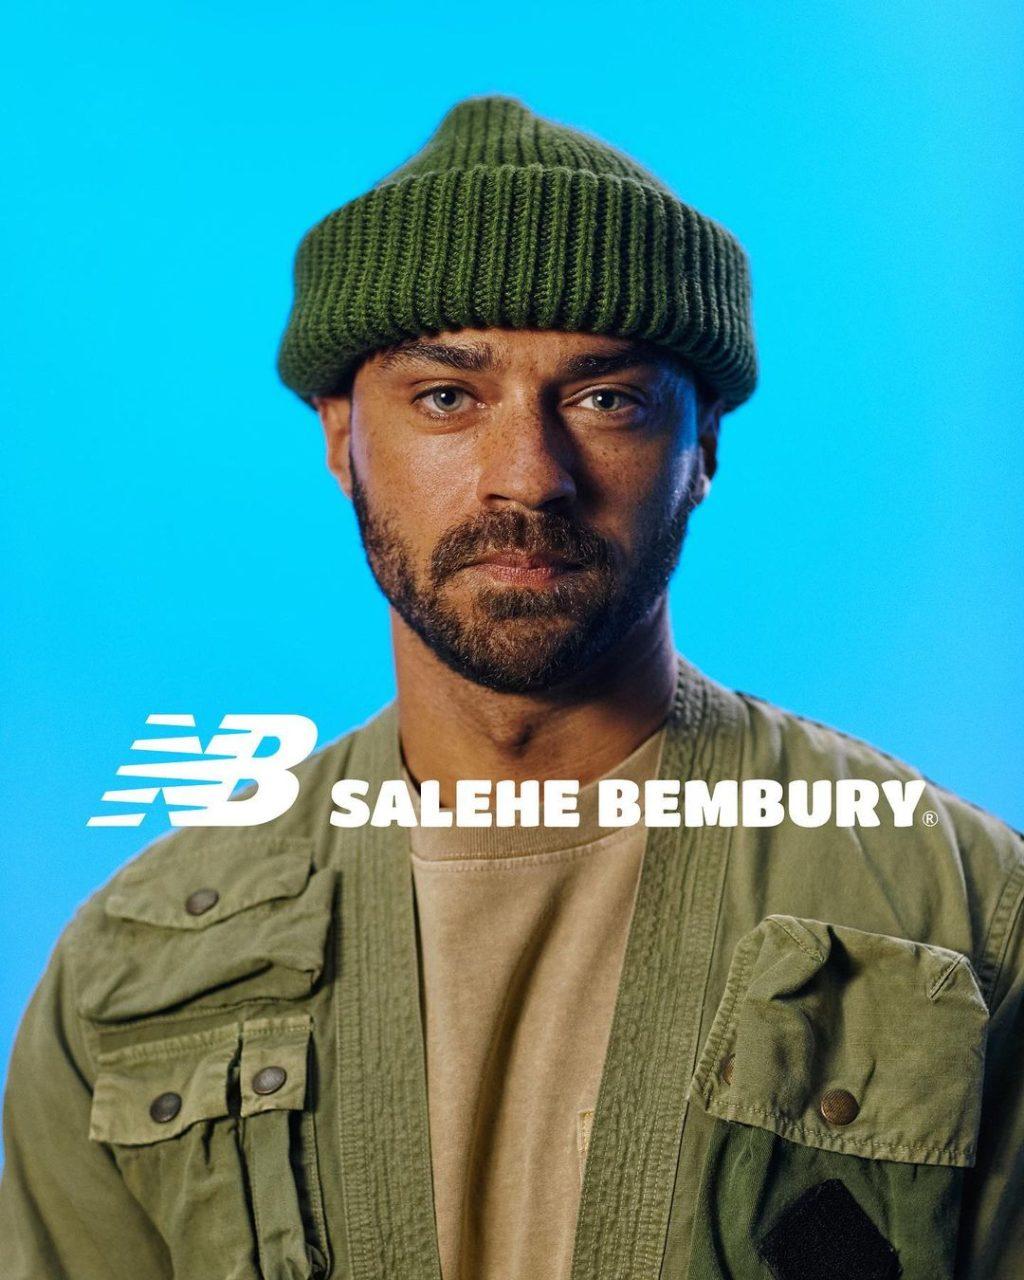 salehe-bembury-new-balance-ml2002rj-release-20210625